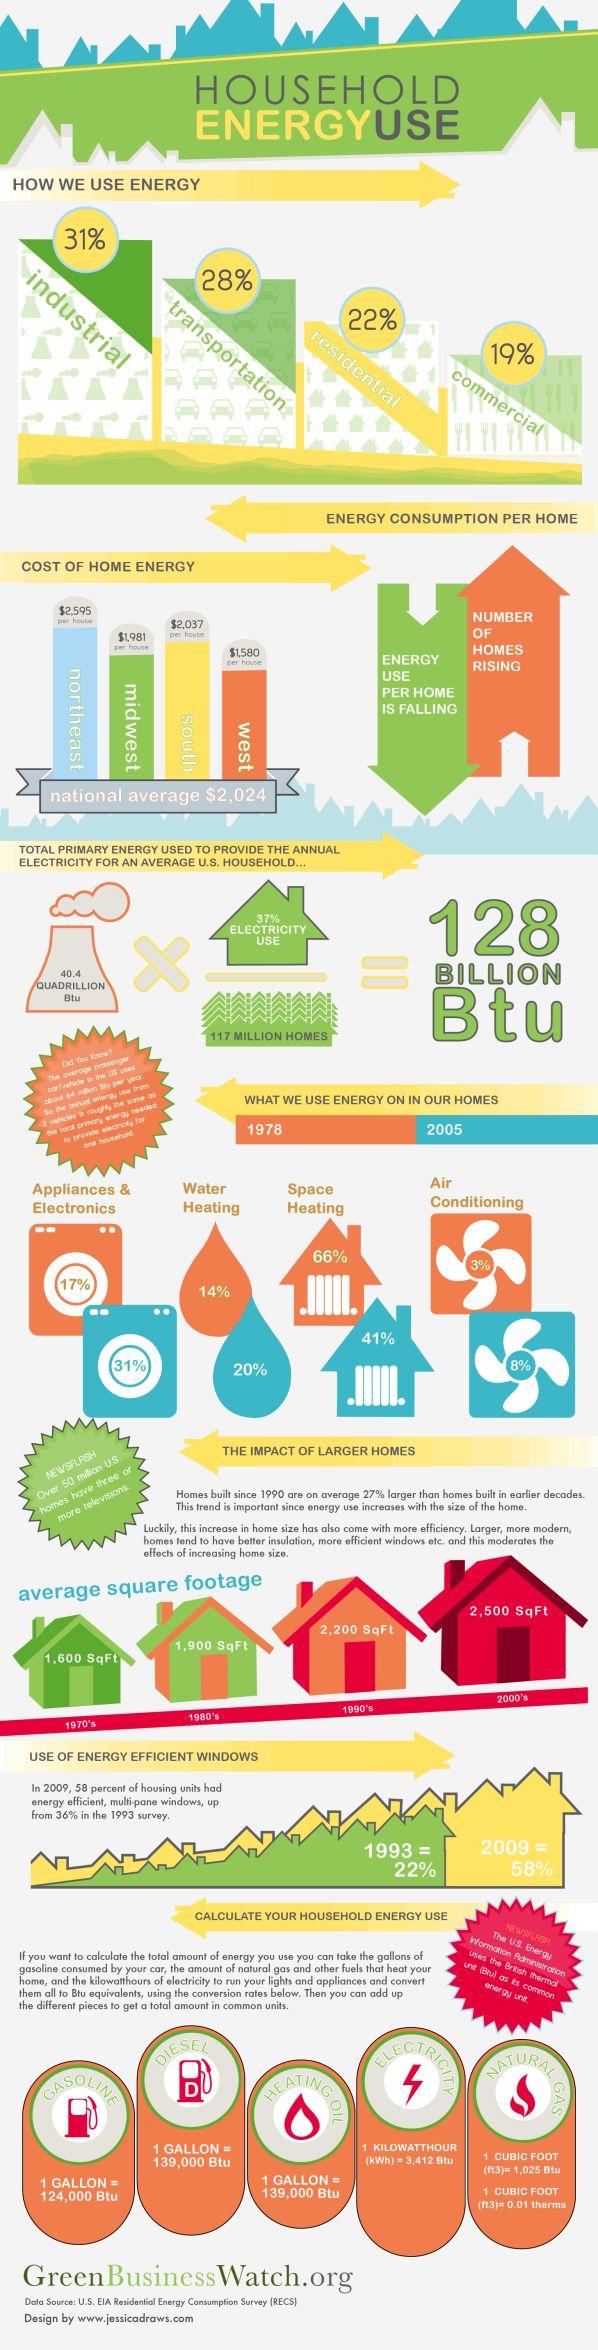 US Home Energy Use [infographic] by http://jessicadraws.com/